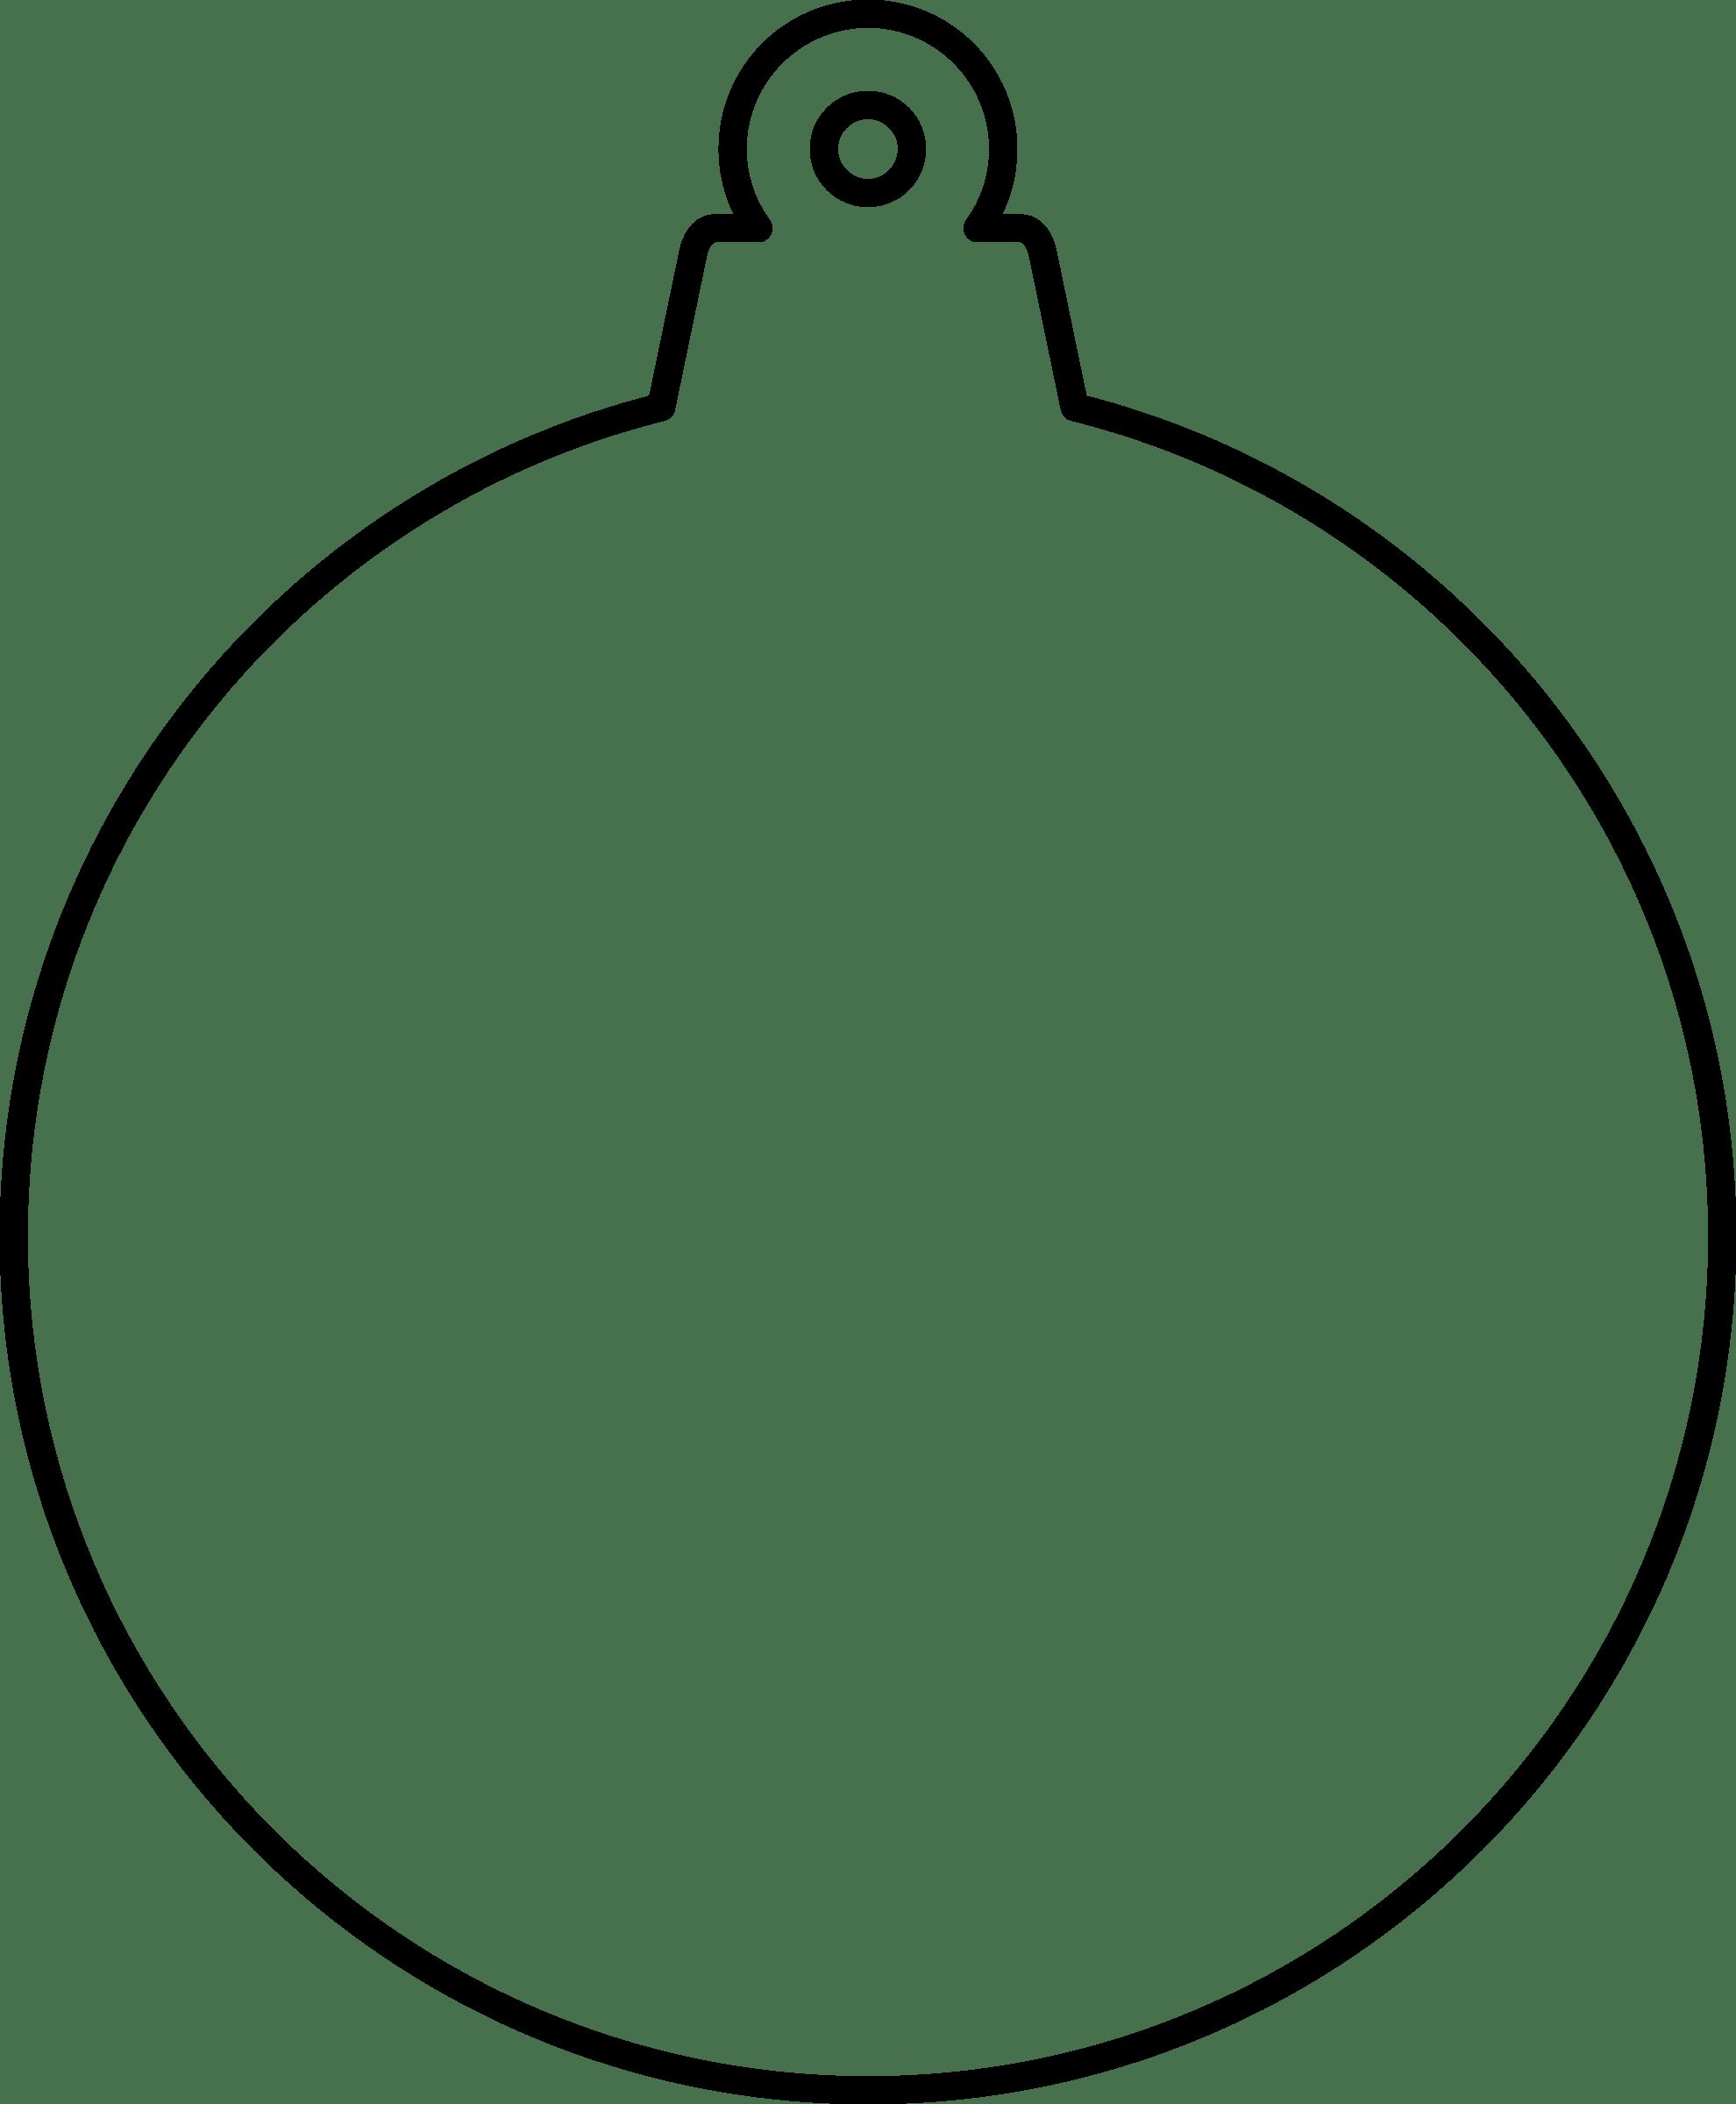 Christmas ornament outline clipart 4 » Clipart Portal.